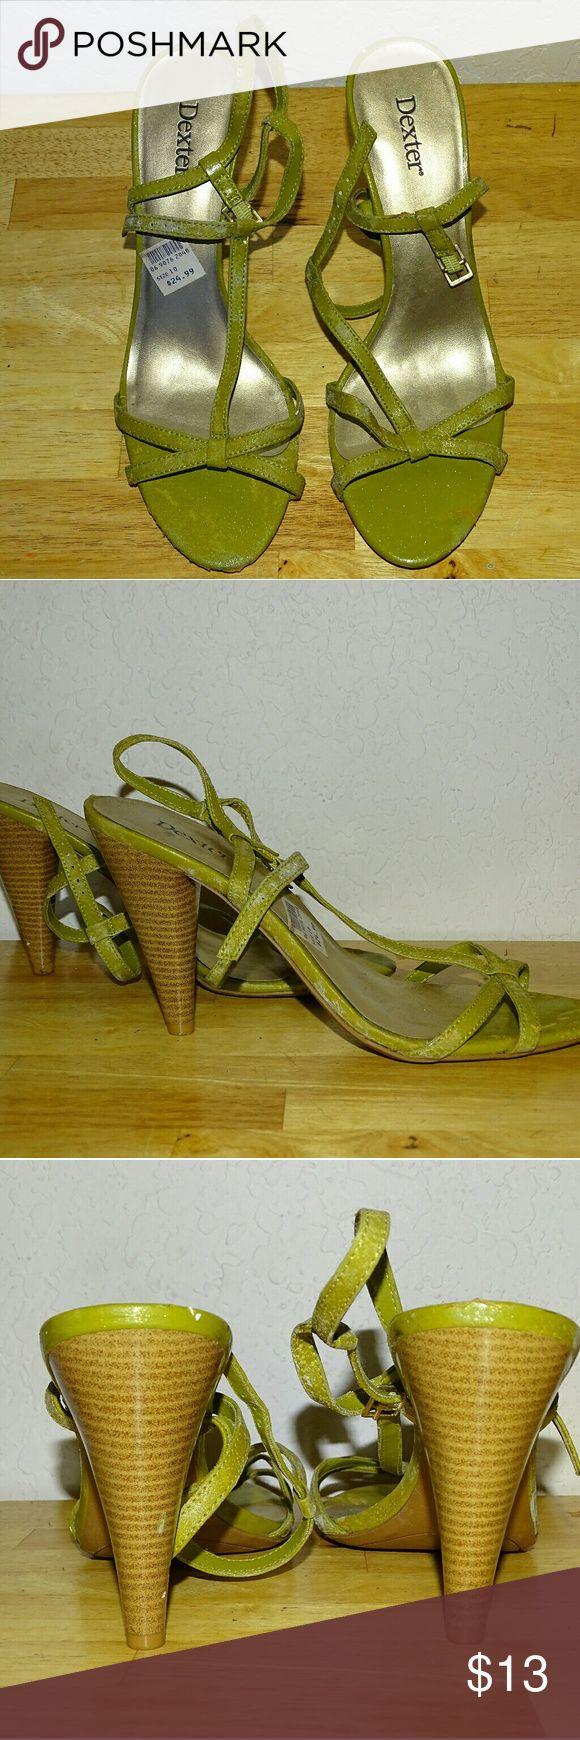 Dexter Sage Green High Heels Size 10 Dexter Sage Green High Heels Size 10 Dexter Shoes Sandals